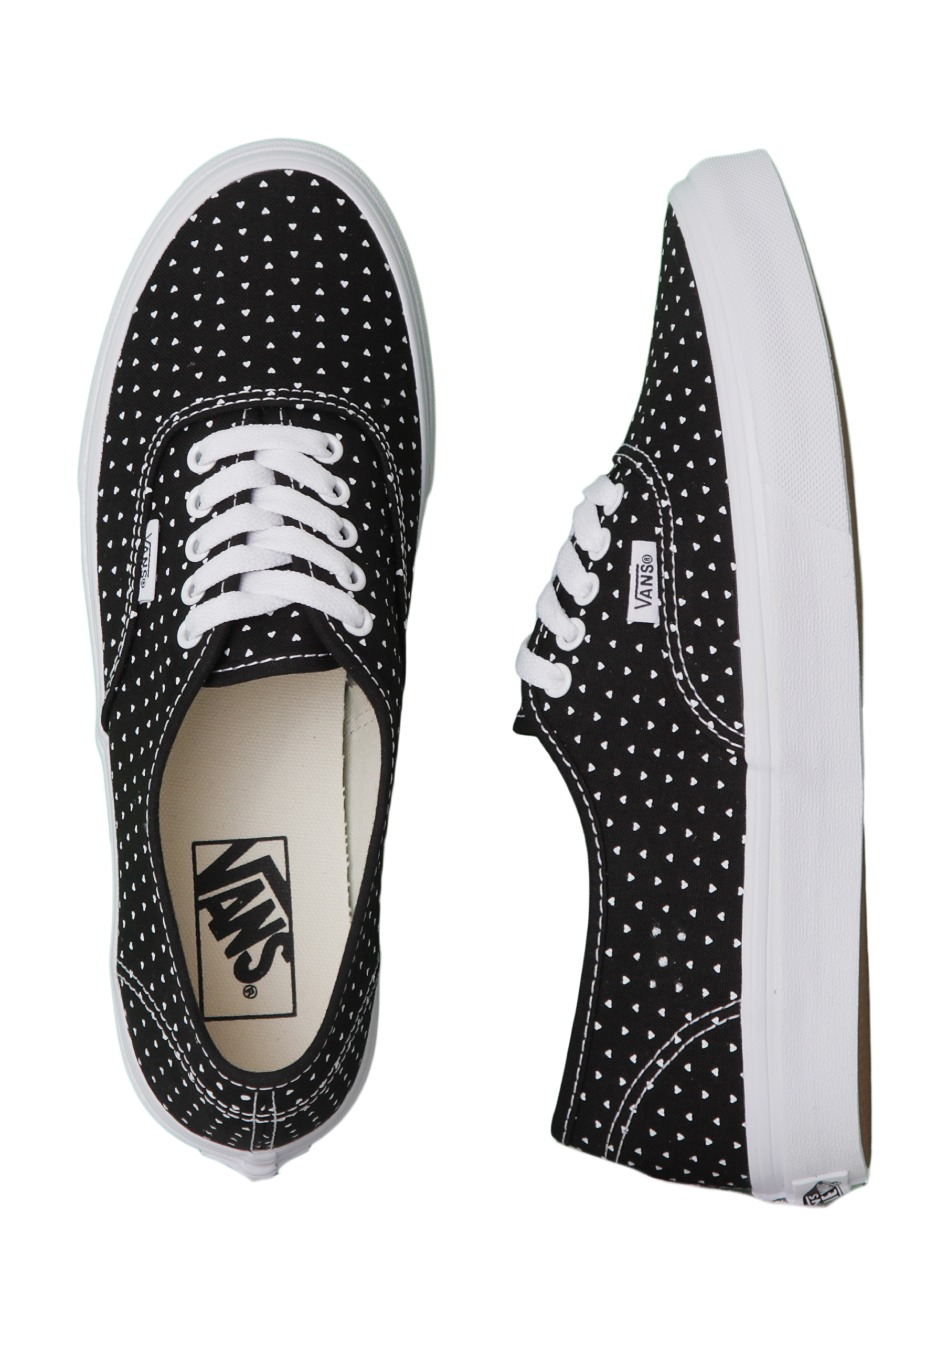 Vans - Authentic Slim Micro Hearts Black/True White - Girl Shoes ...